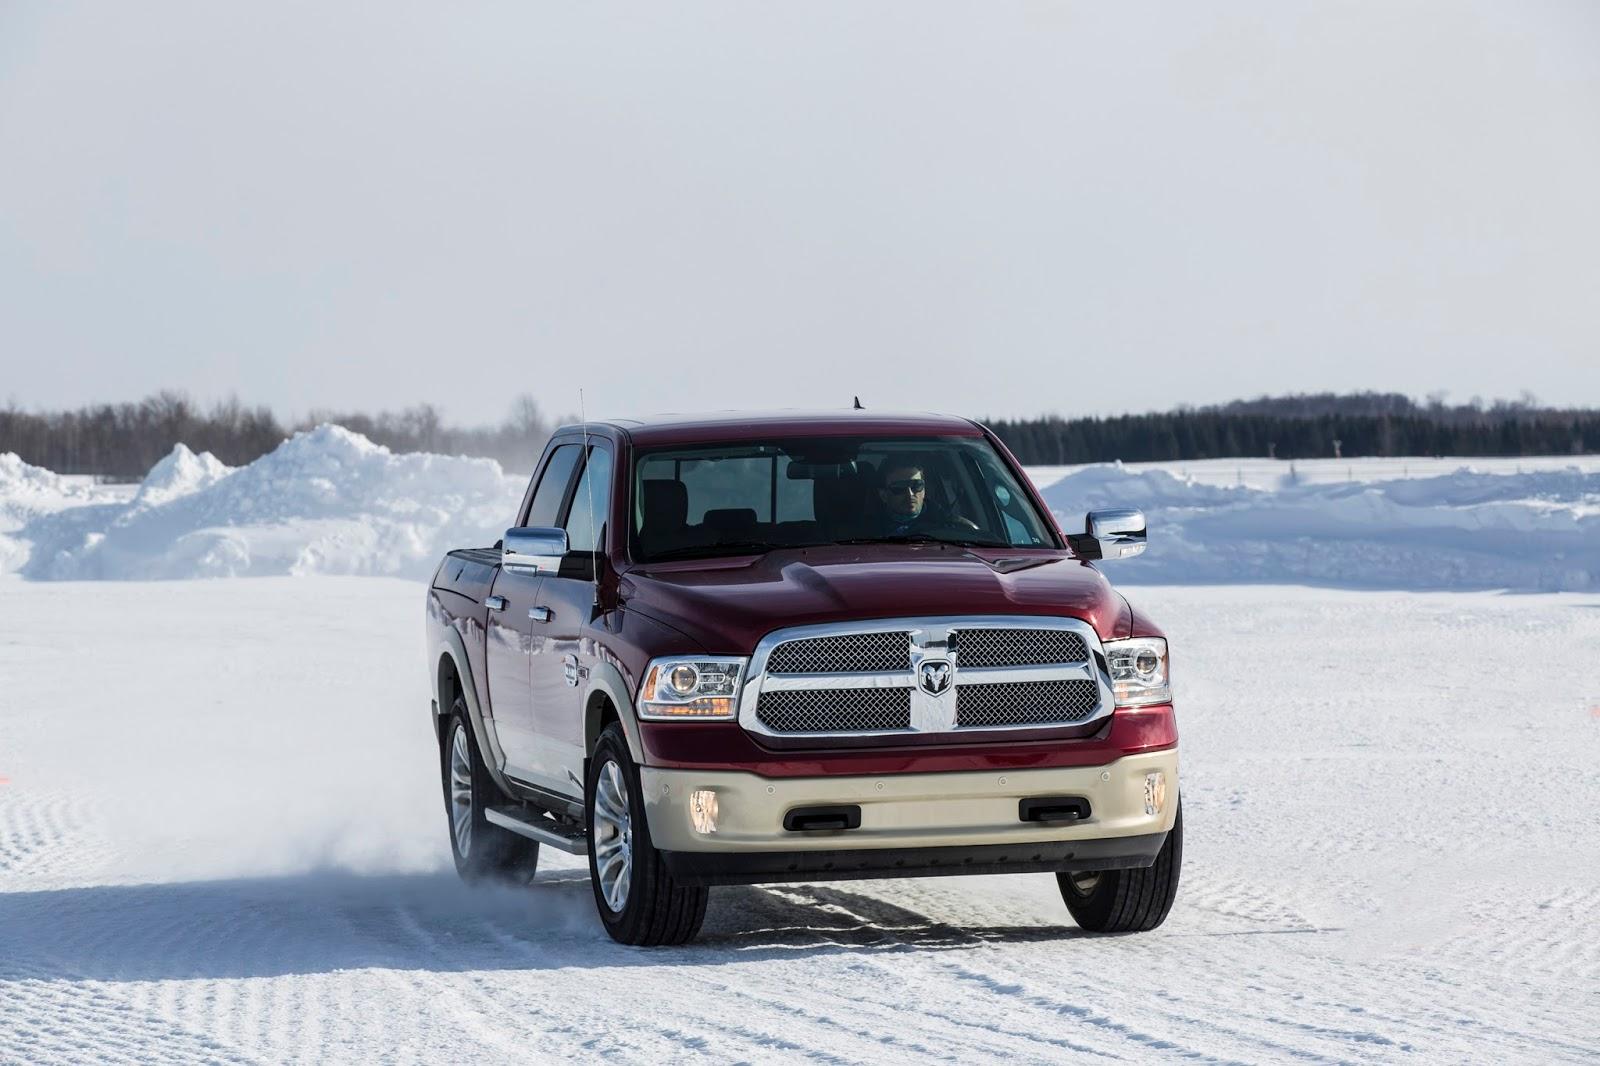 2015 Ram 1500 snow